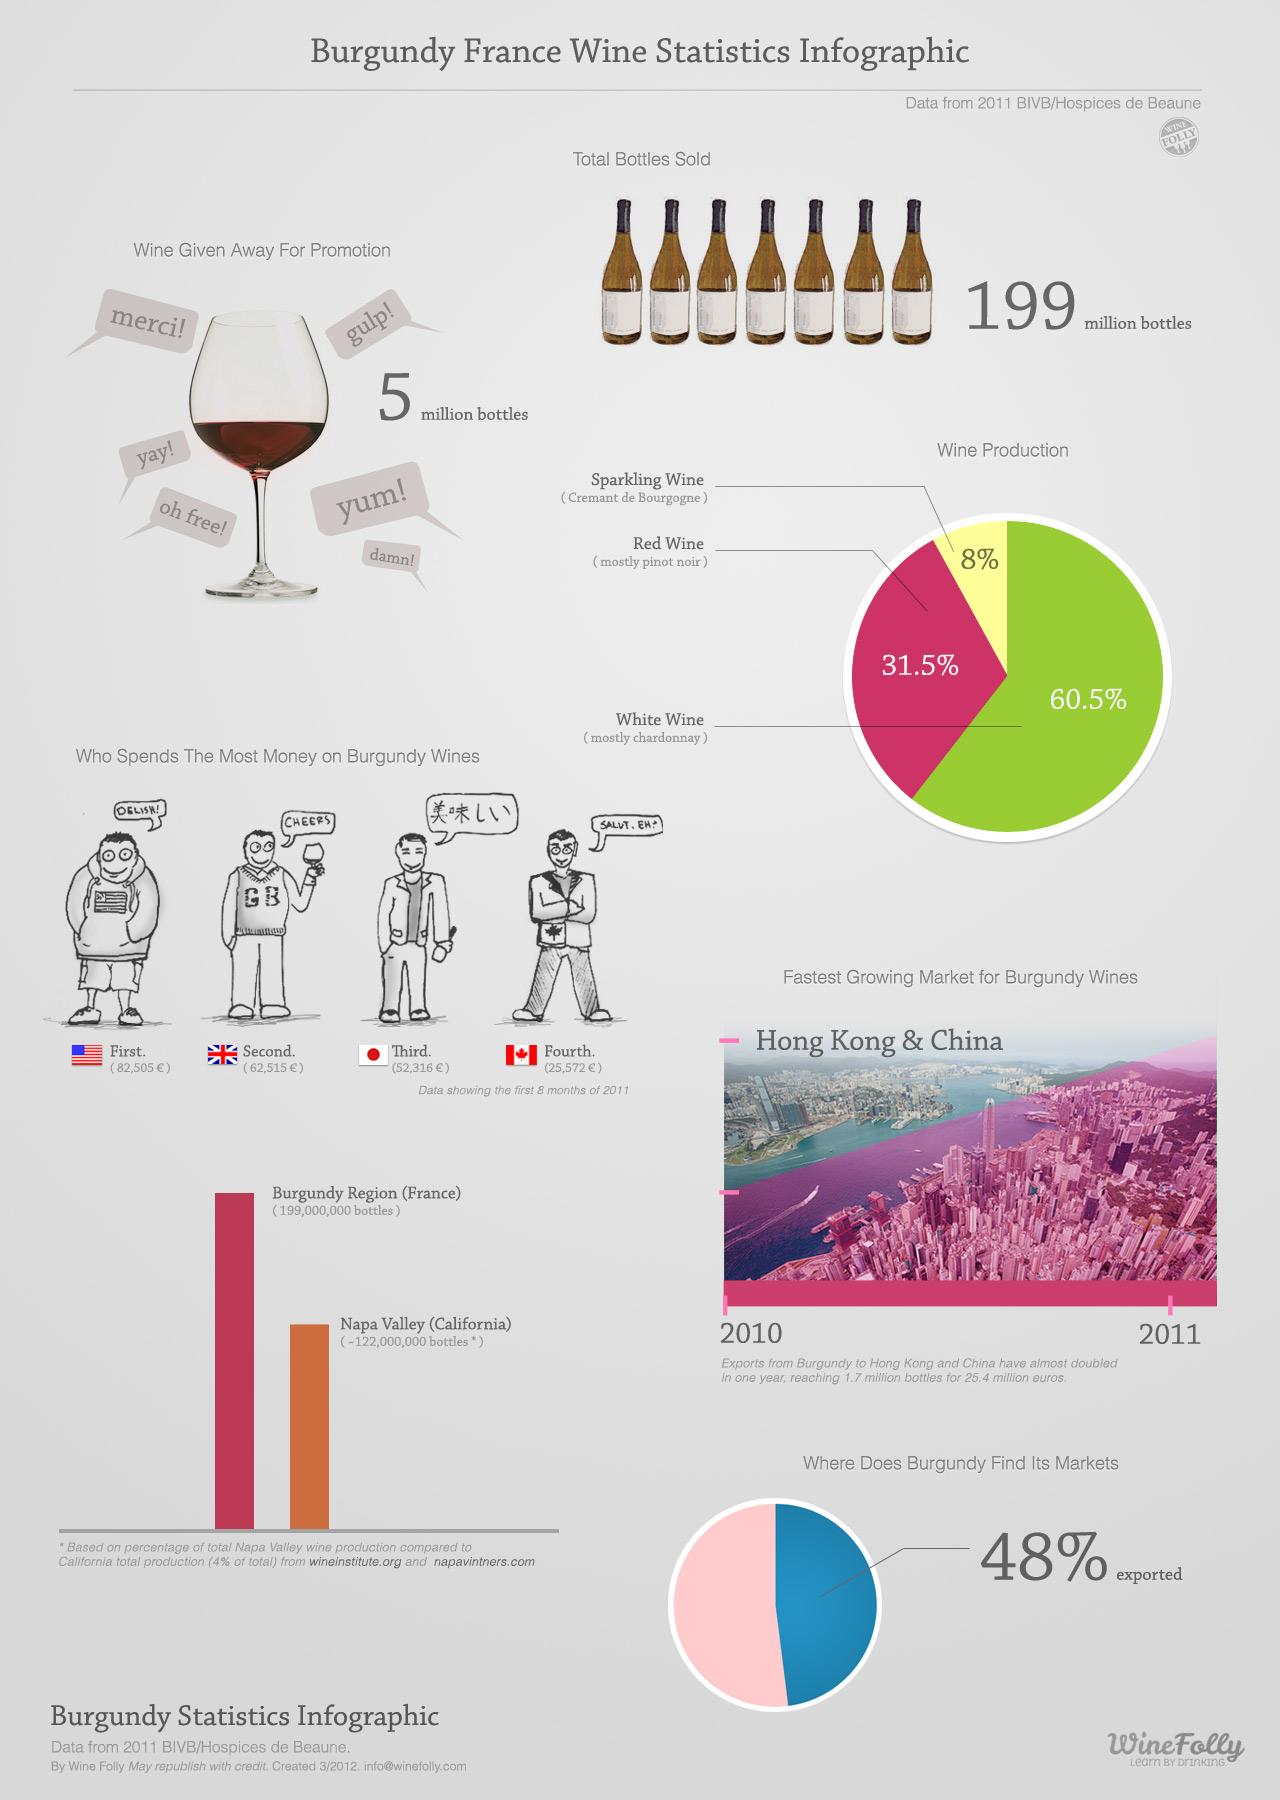 Burgundy Wine Information Statistics Infographic